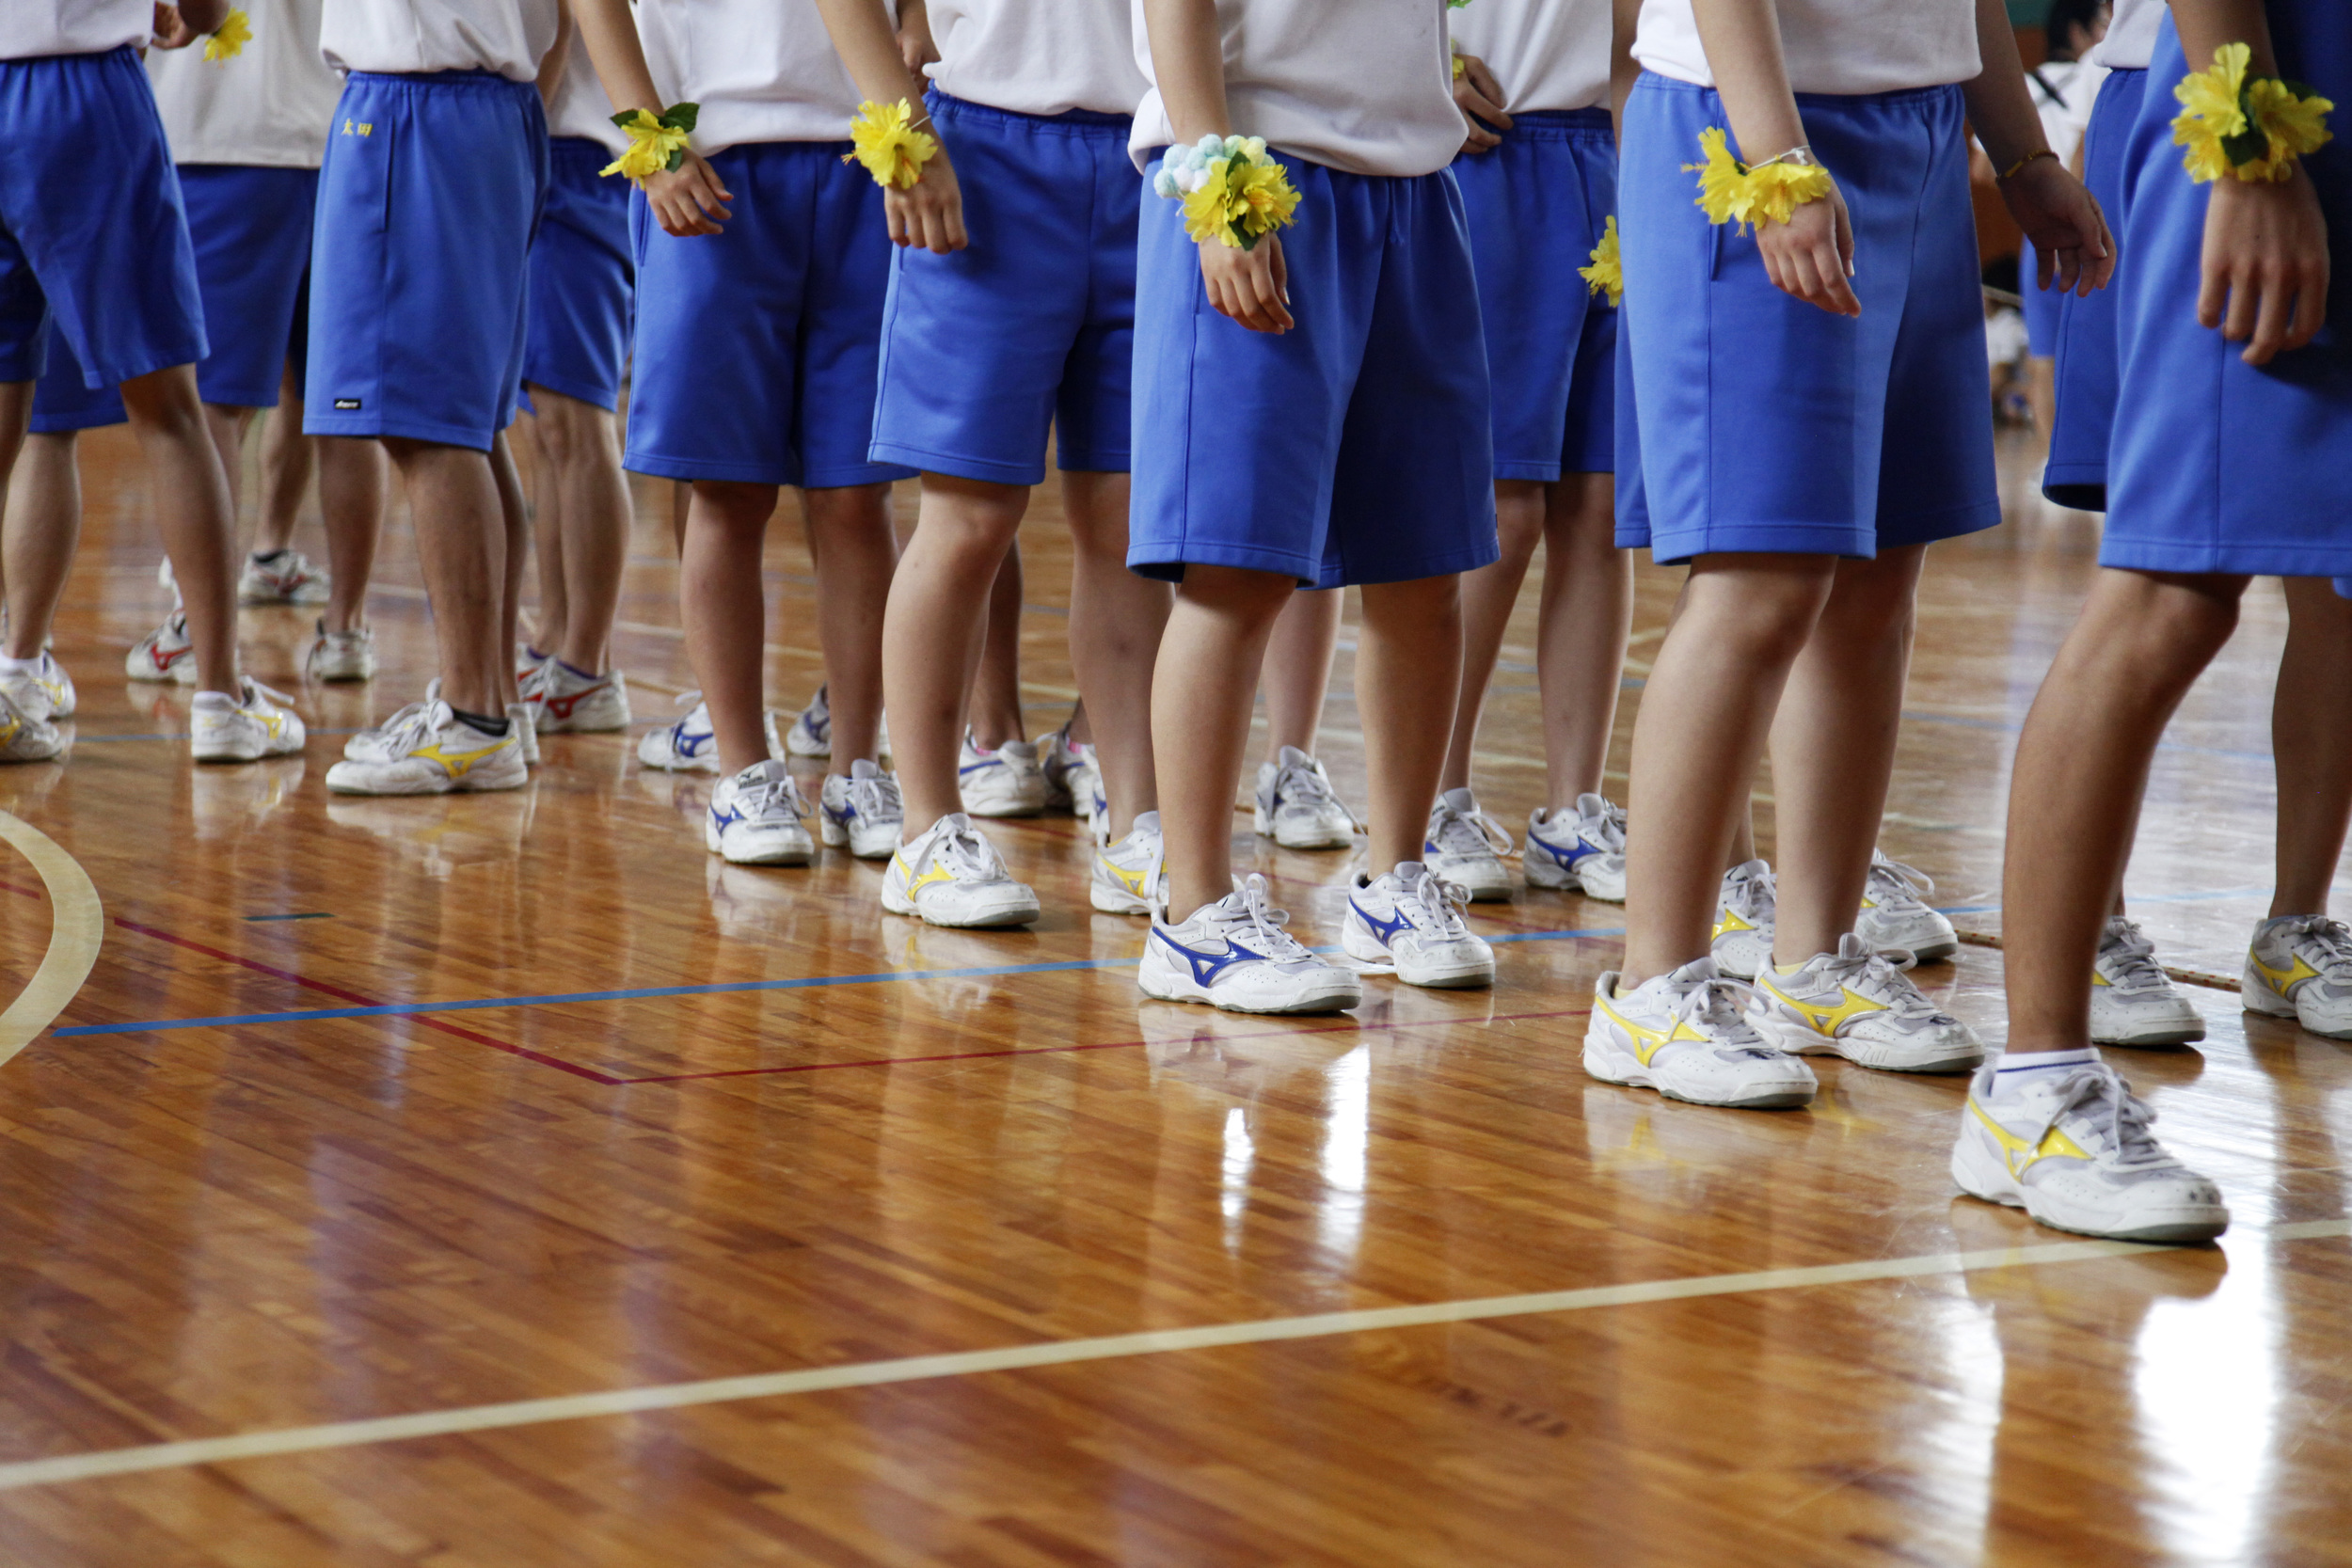 It's Sports Day (Urasa, Niigata)